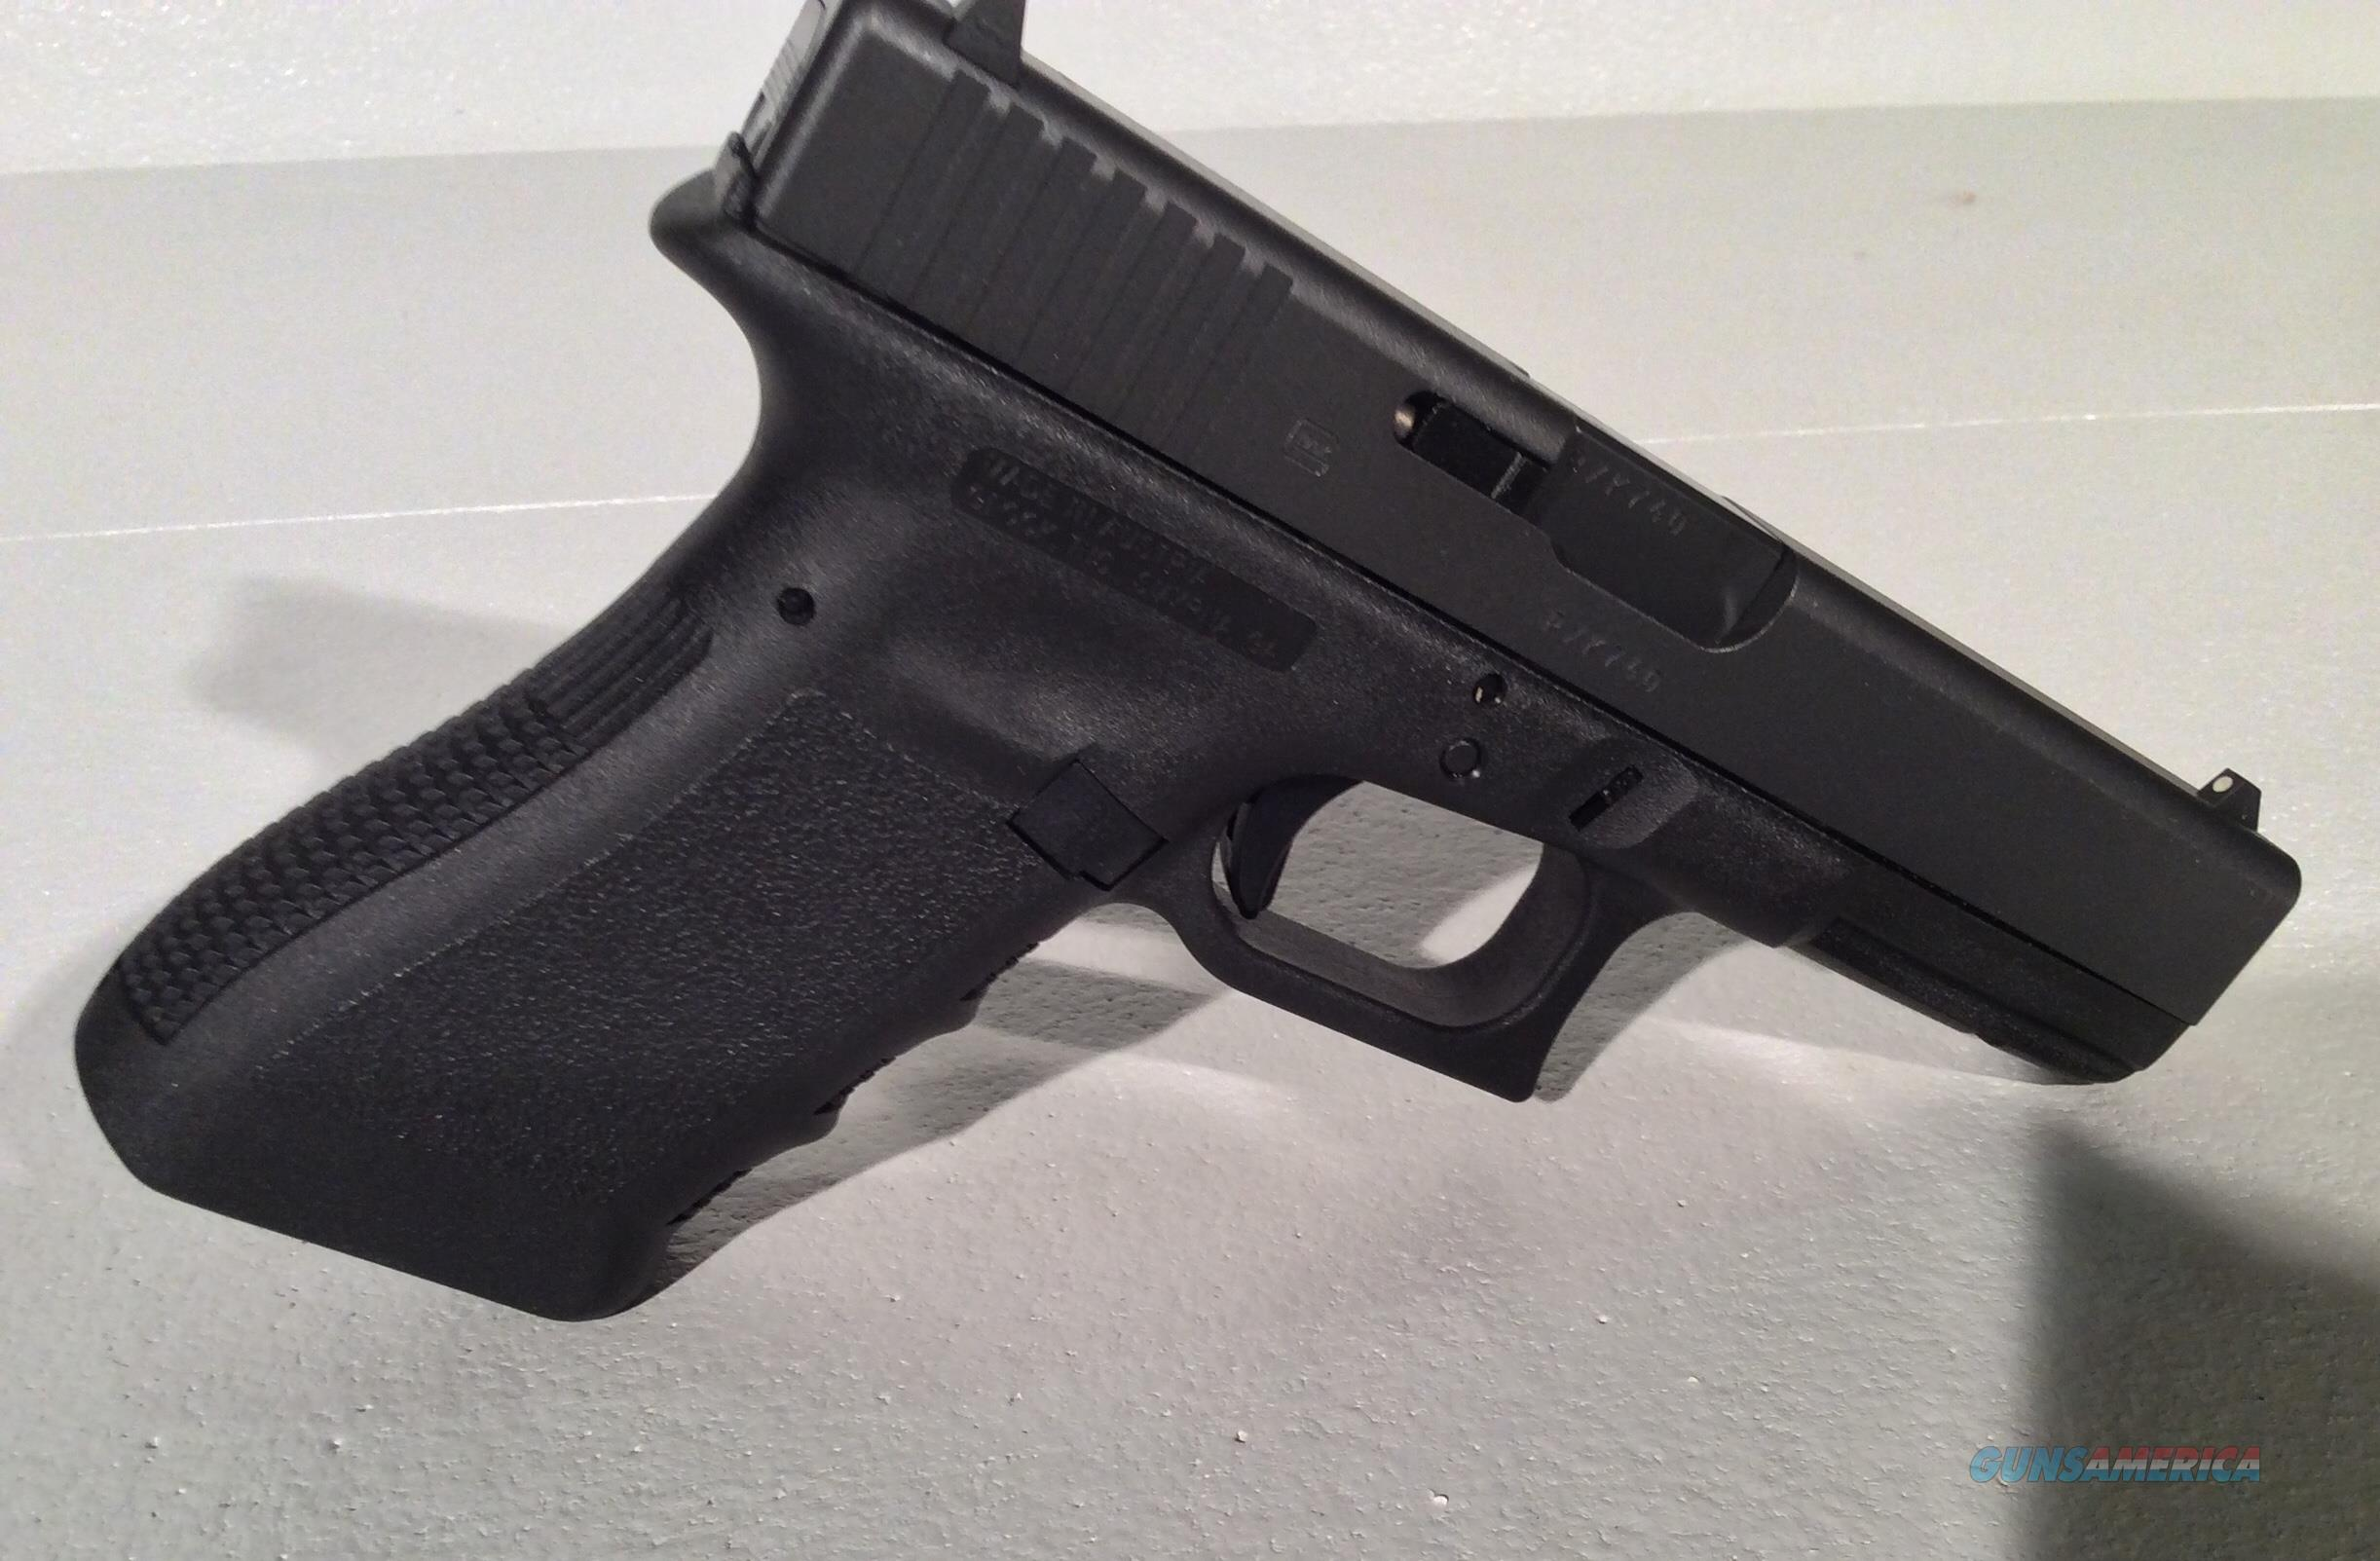 Glock 17 Gen 3 (never fired)  Guns > Pistols > Glock Pistols > 17